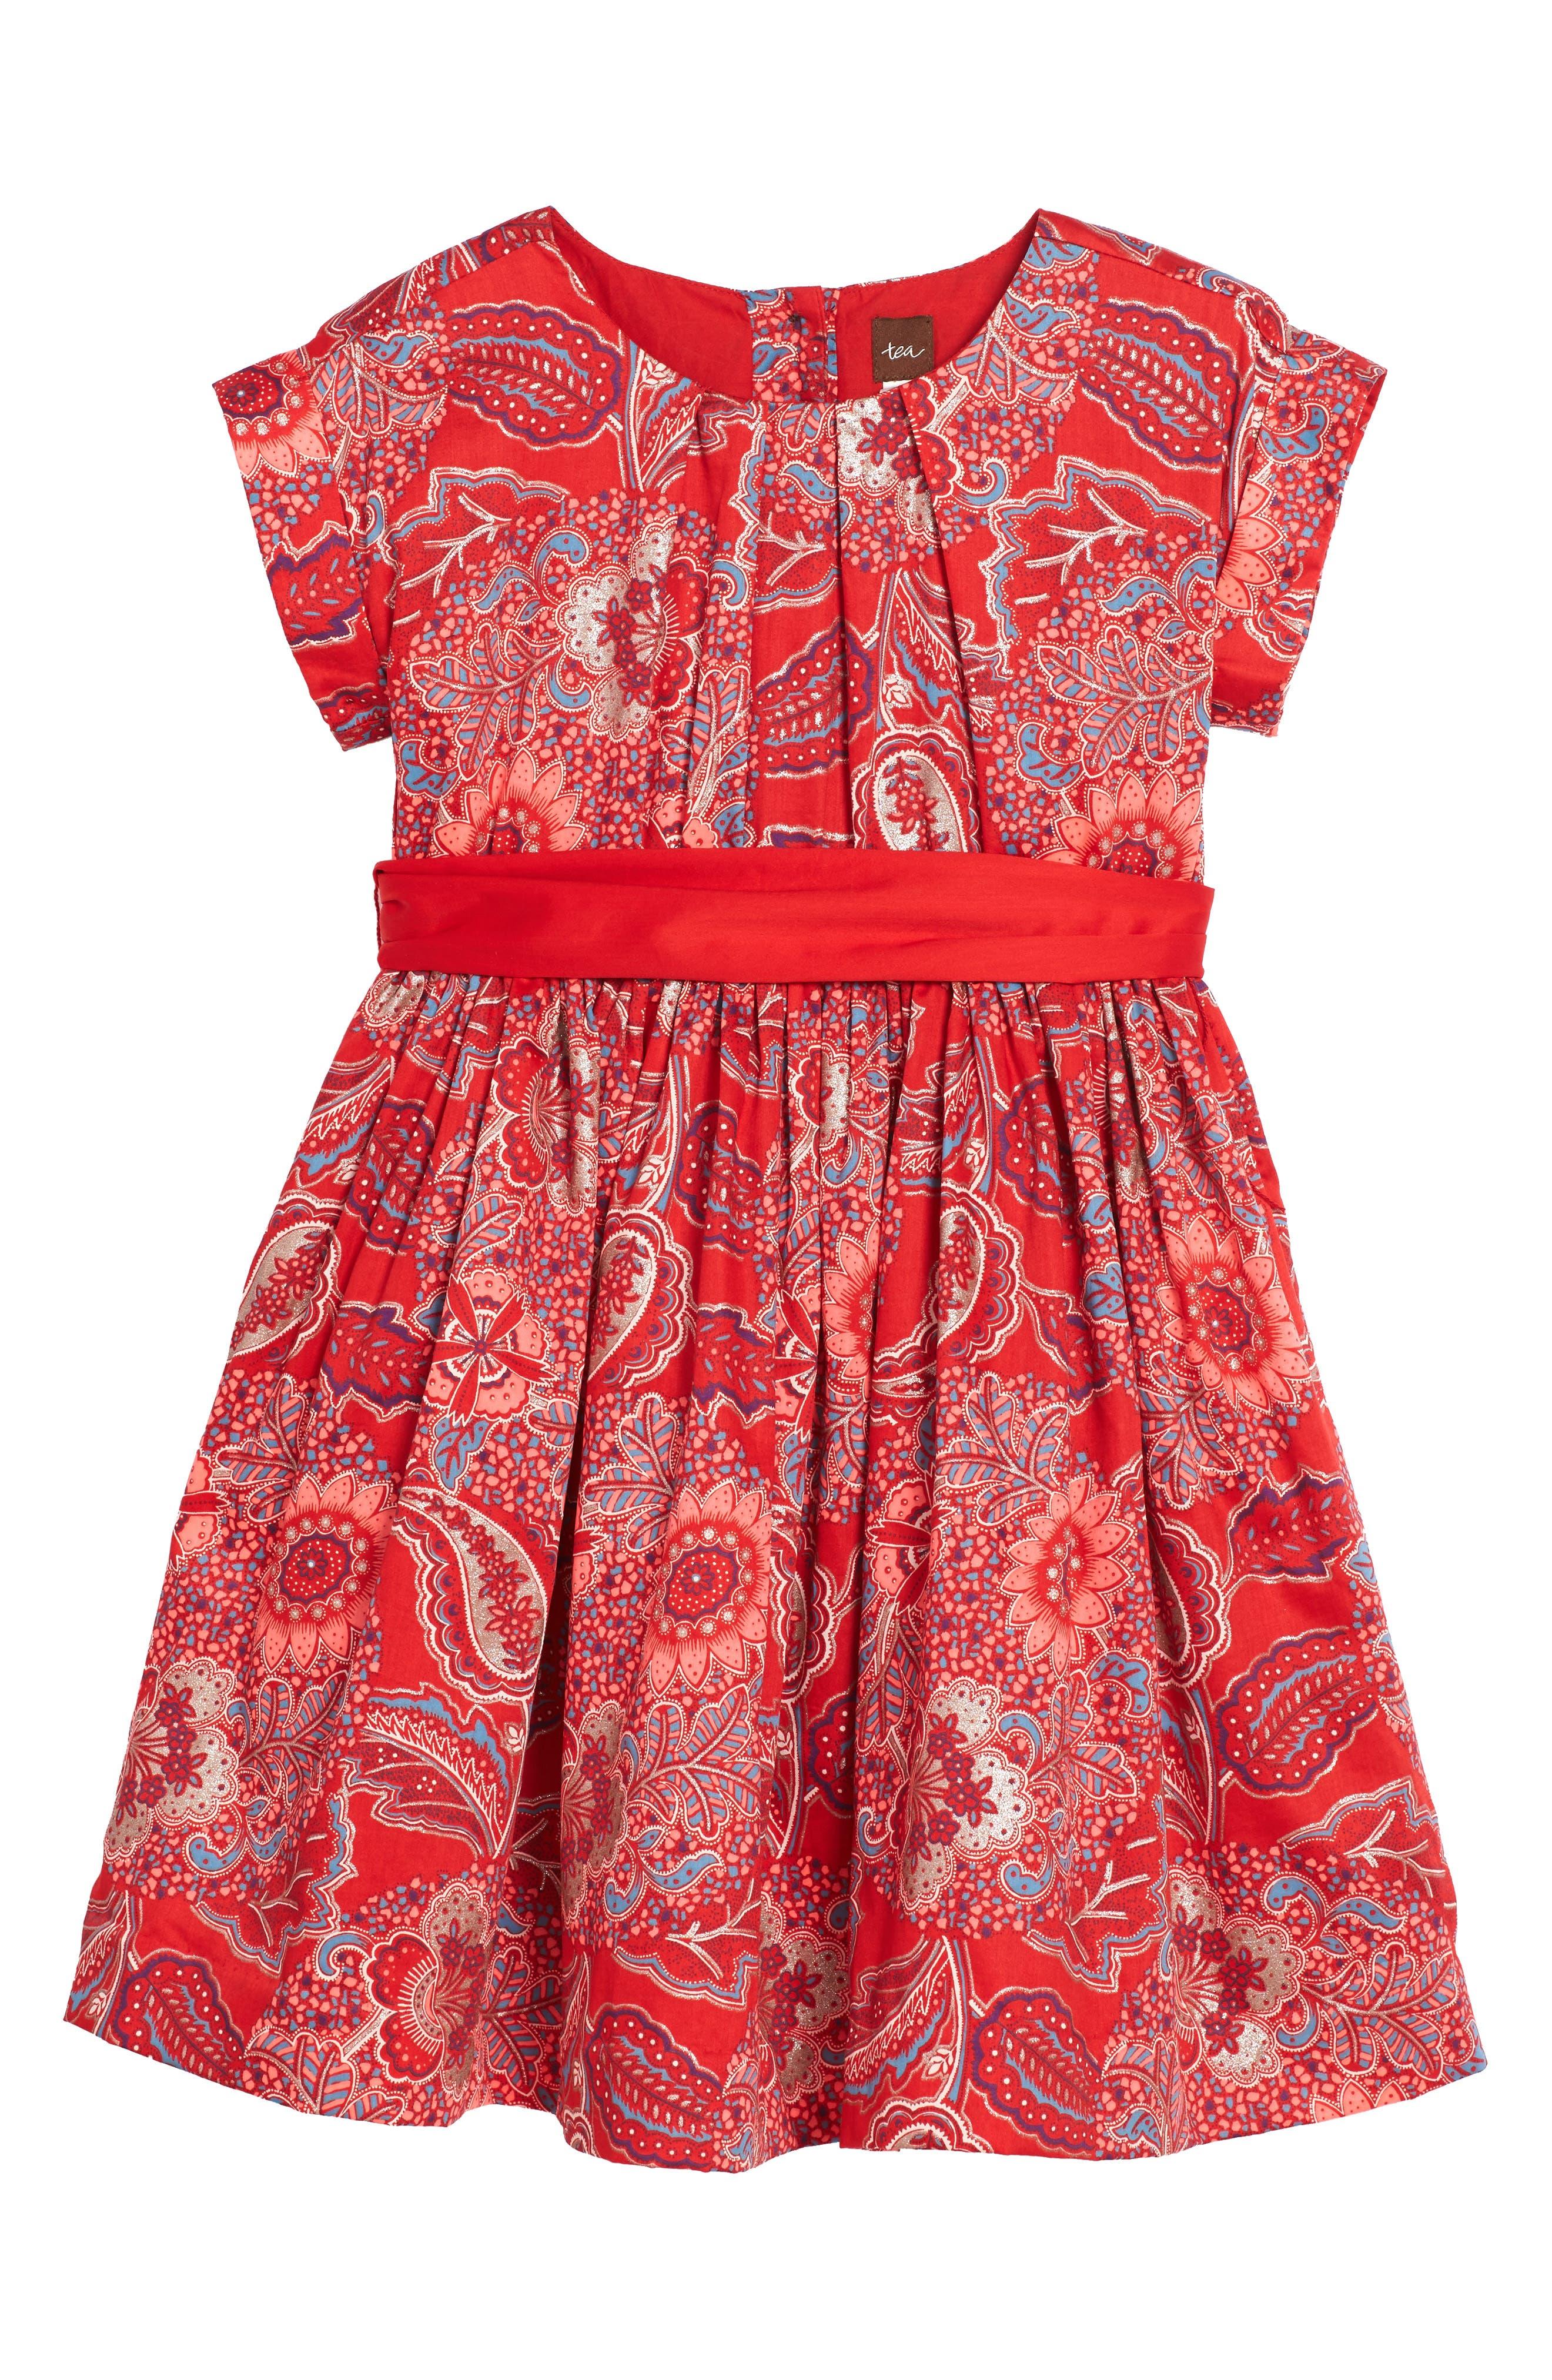 Alternate Image 1 Selected - Tea Collection Adaira Sash Dress (Toddler Girls, Little Girls & Big Girls)